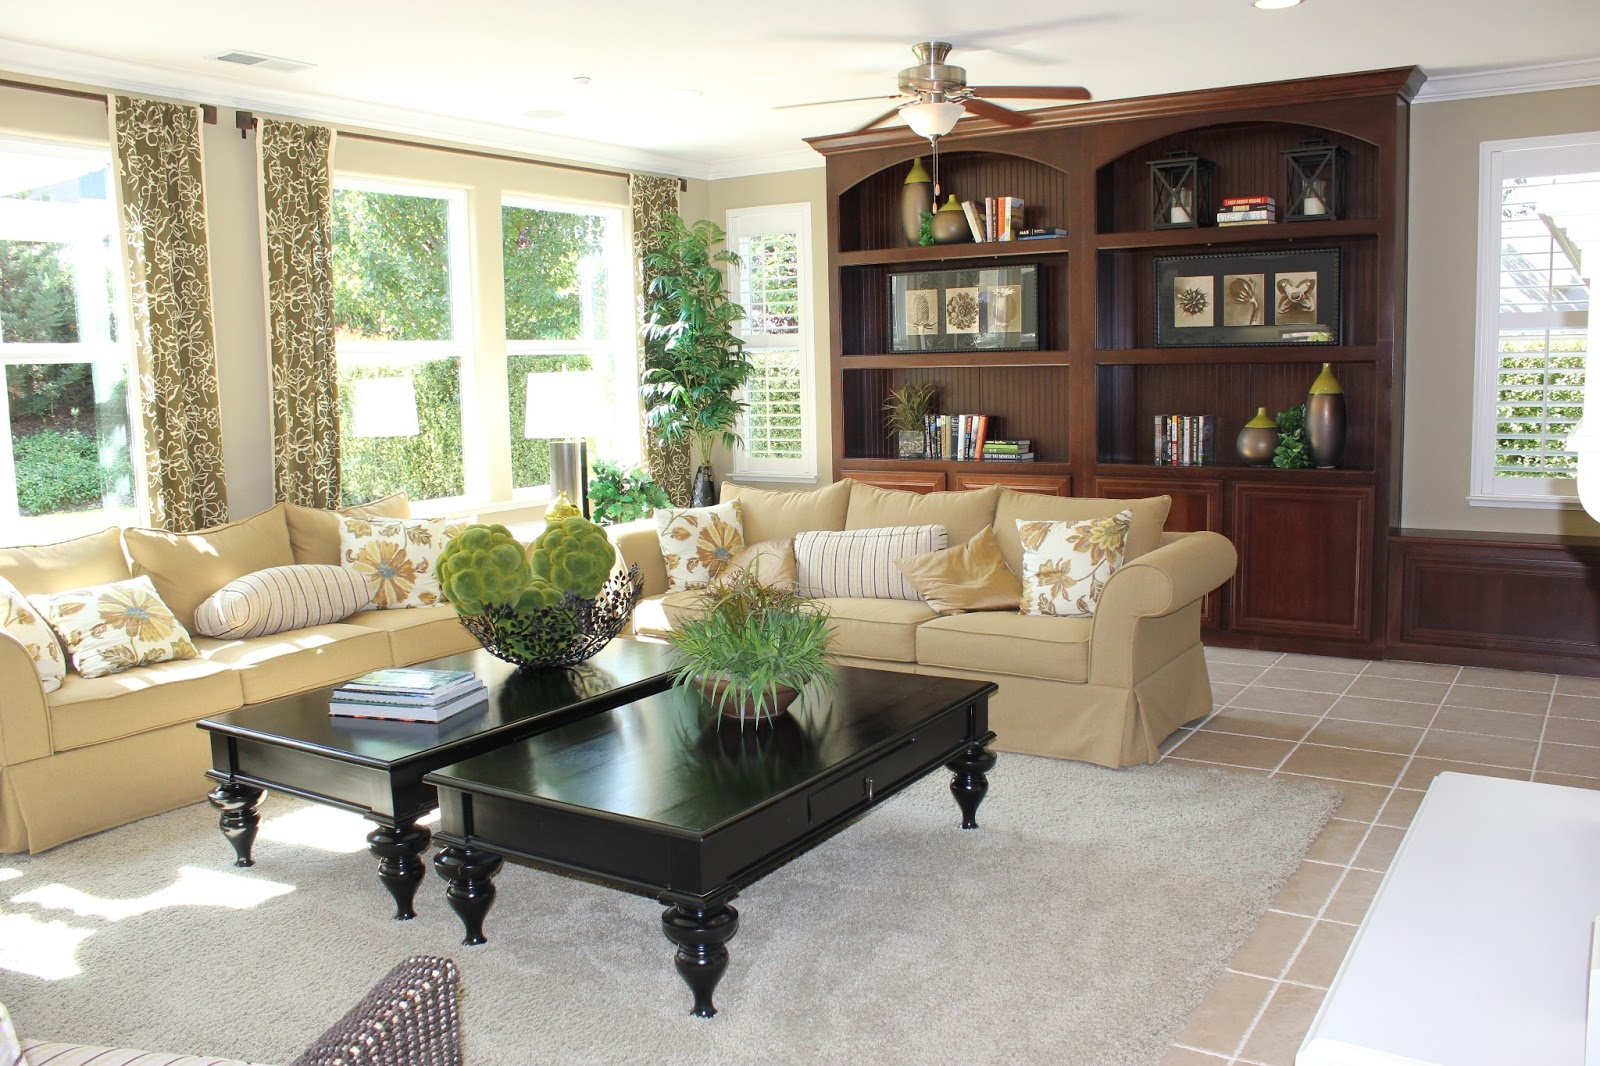 Simas Floor and Design Company: How to Select a Custom Area Rug